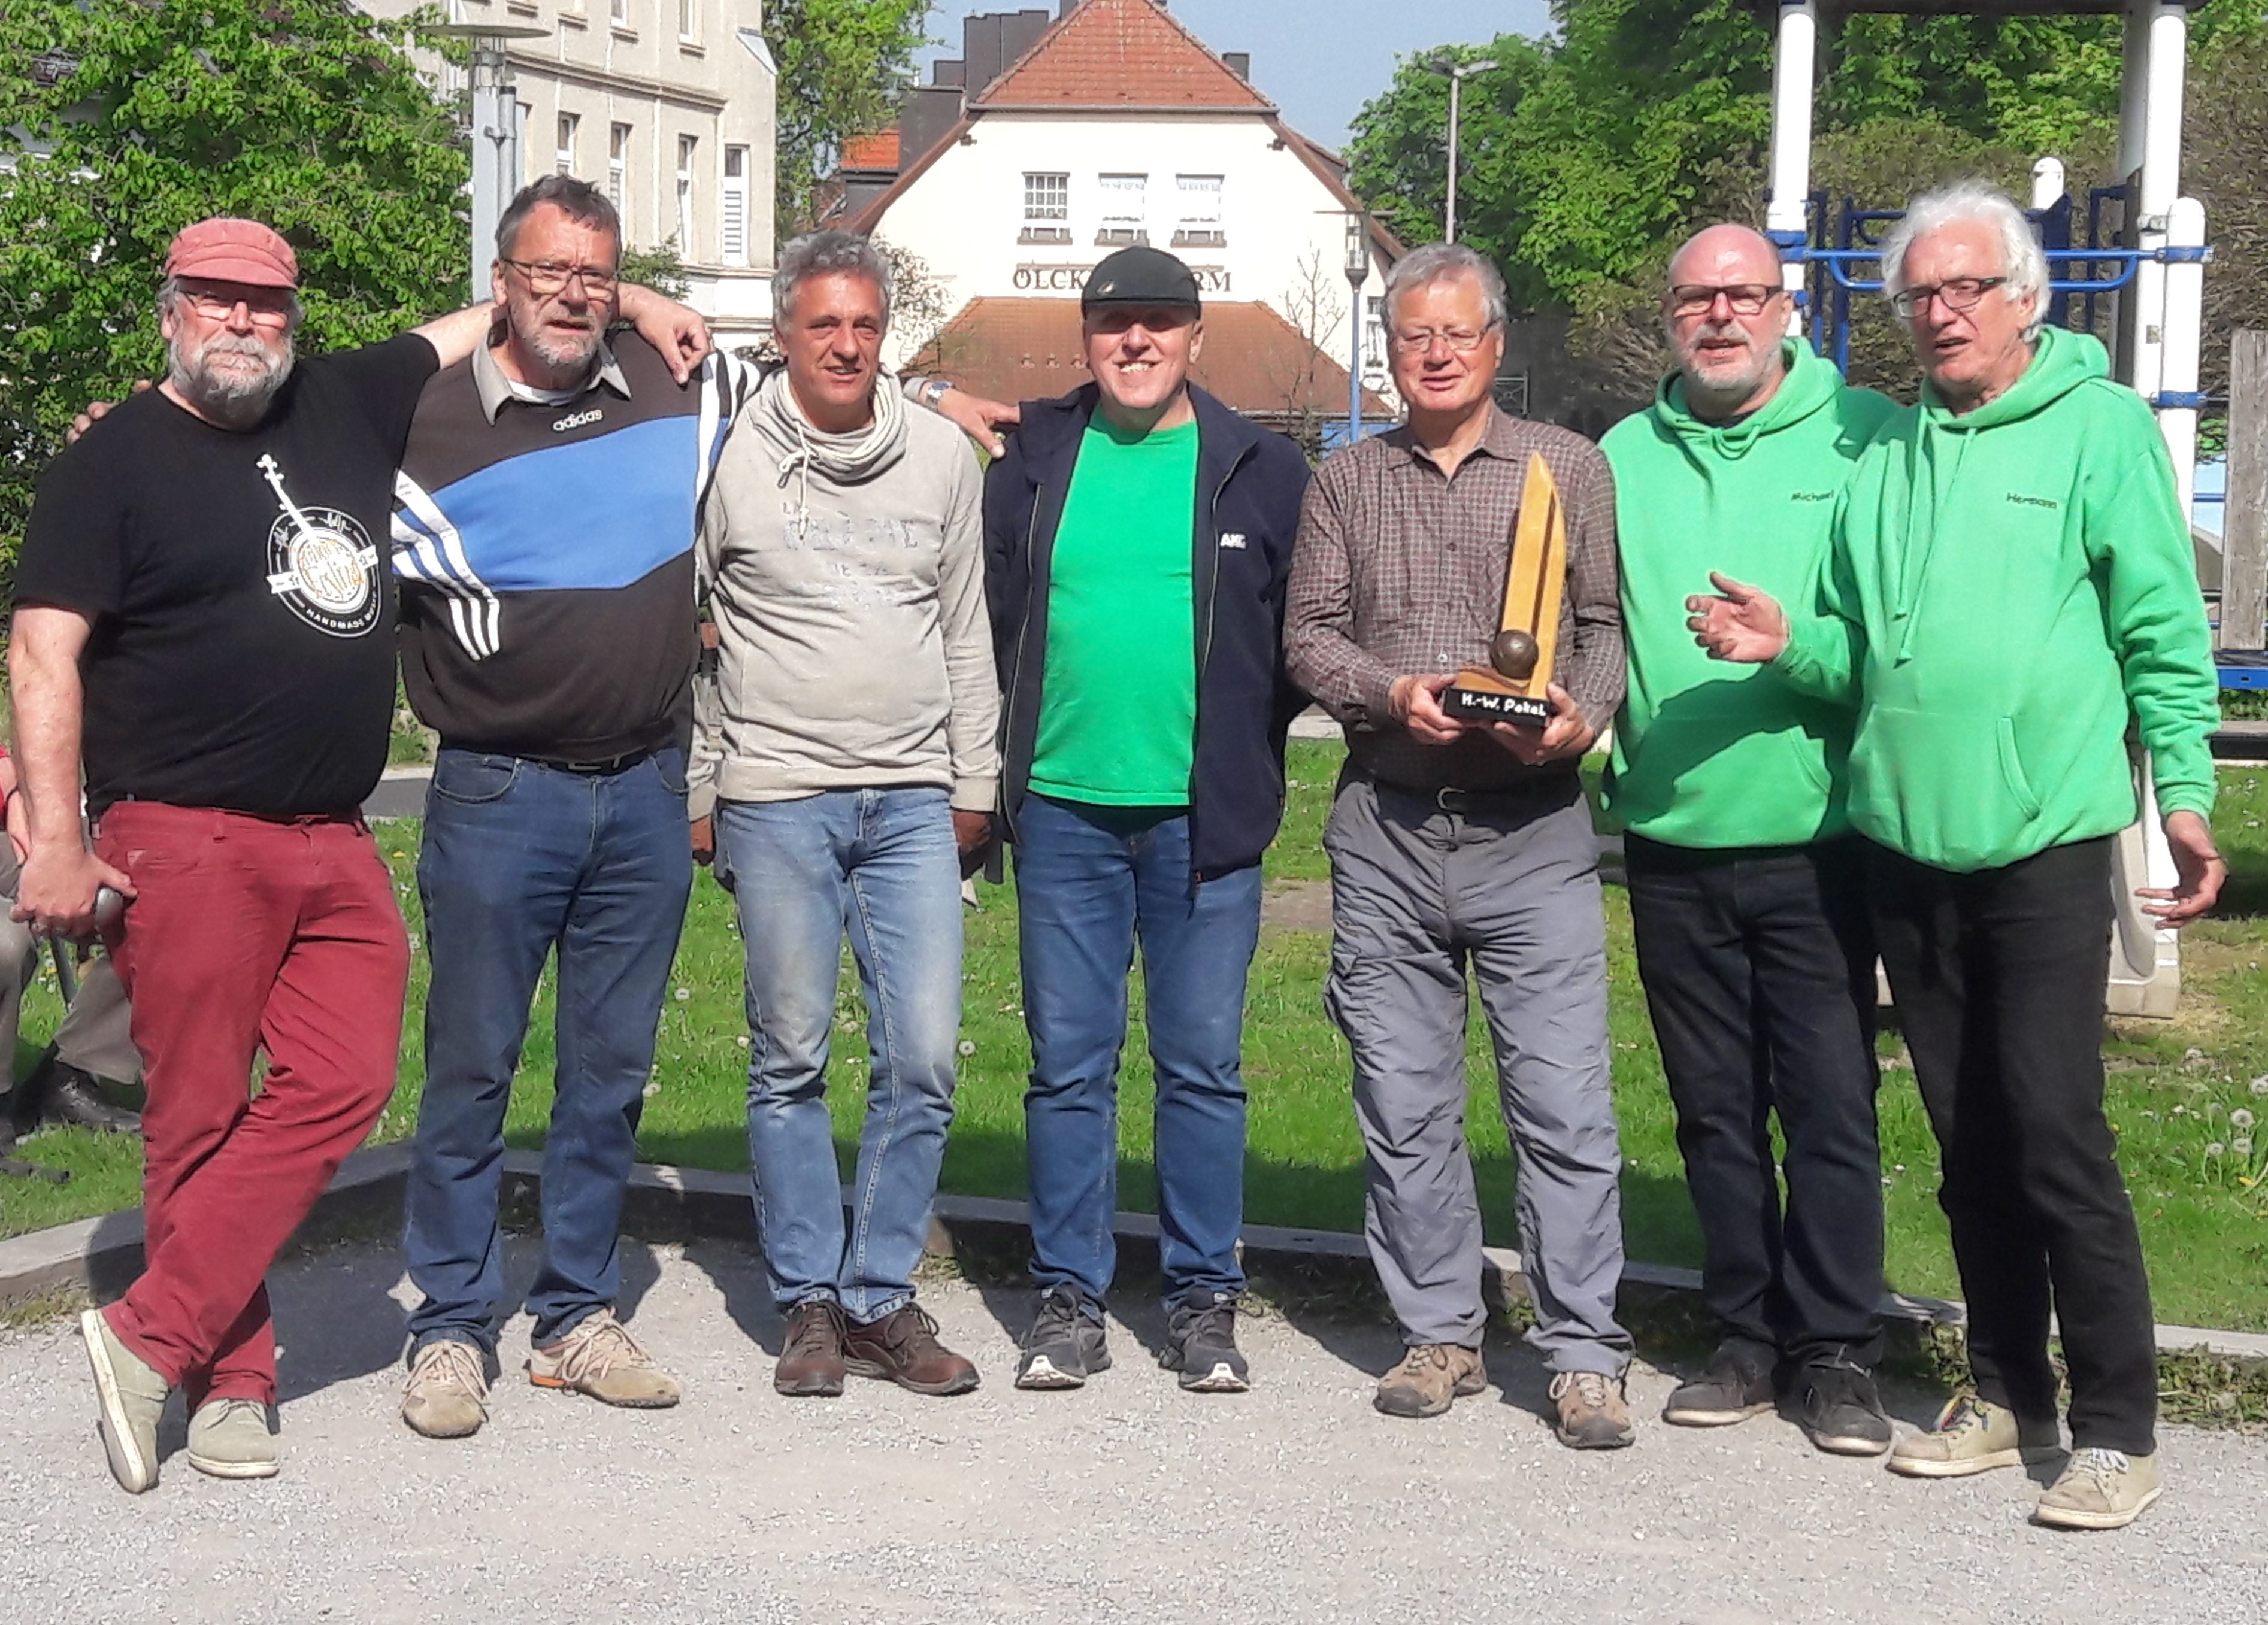 Jan, Ulli,Gisi, Ralf, Norbert, Michael und Hermann